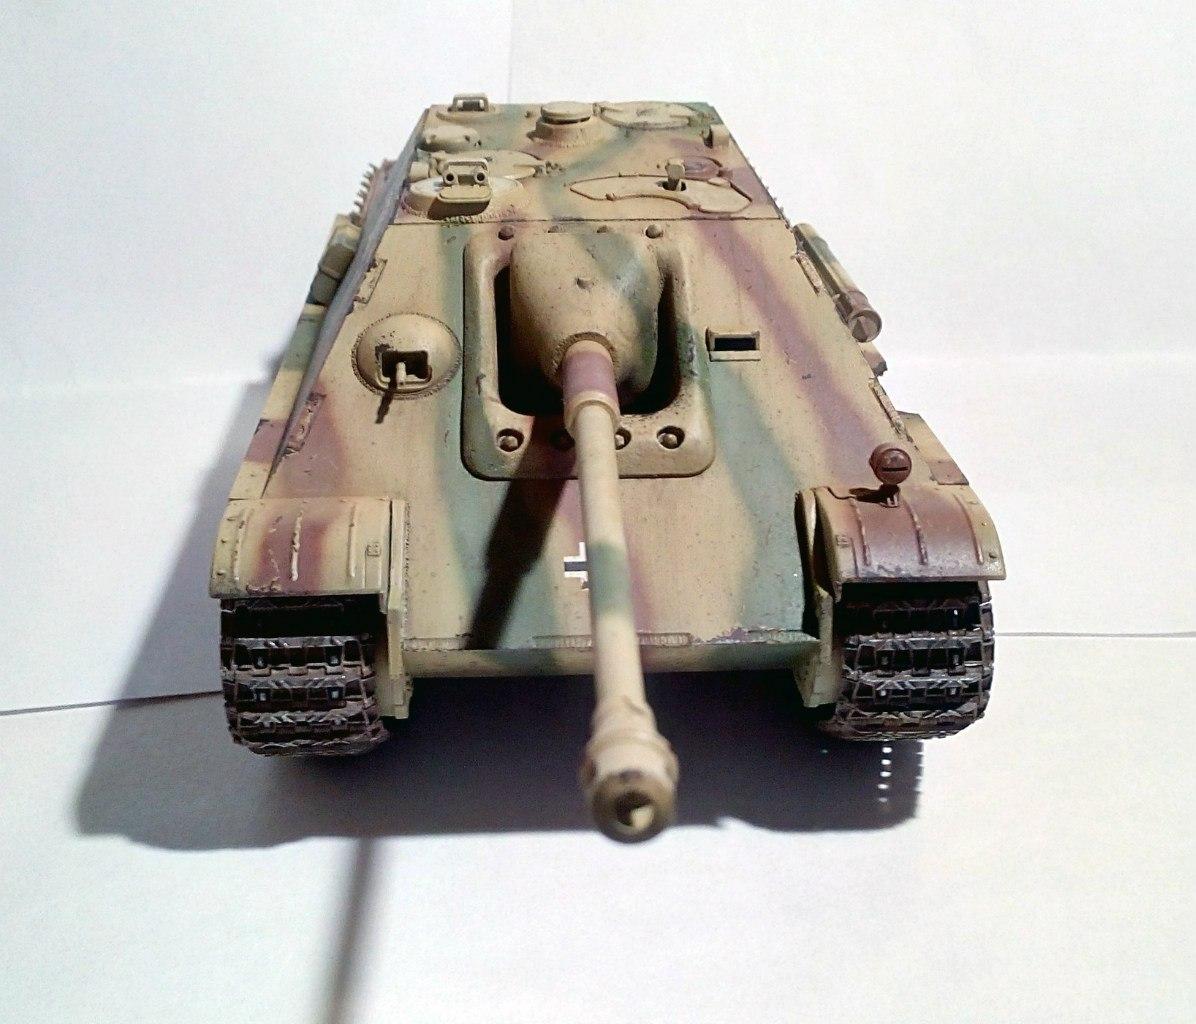 Jagdpanther (Late\поздний вариант) (Tamiya 35203 1/35) - Страница 2 0Zcl41FXWm0